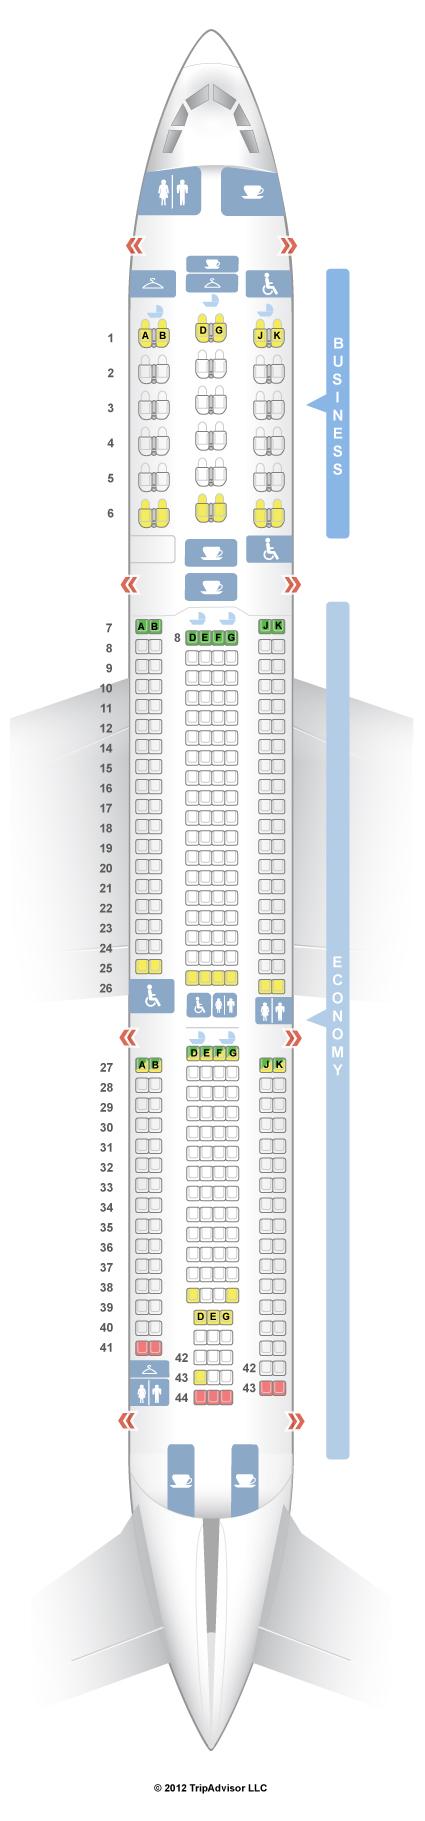 Seatguru Seat Map China Airlines Airbus A330 300 333 V1